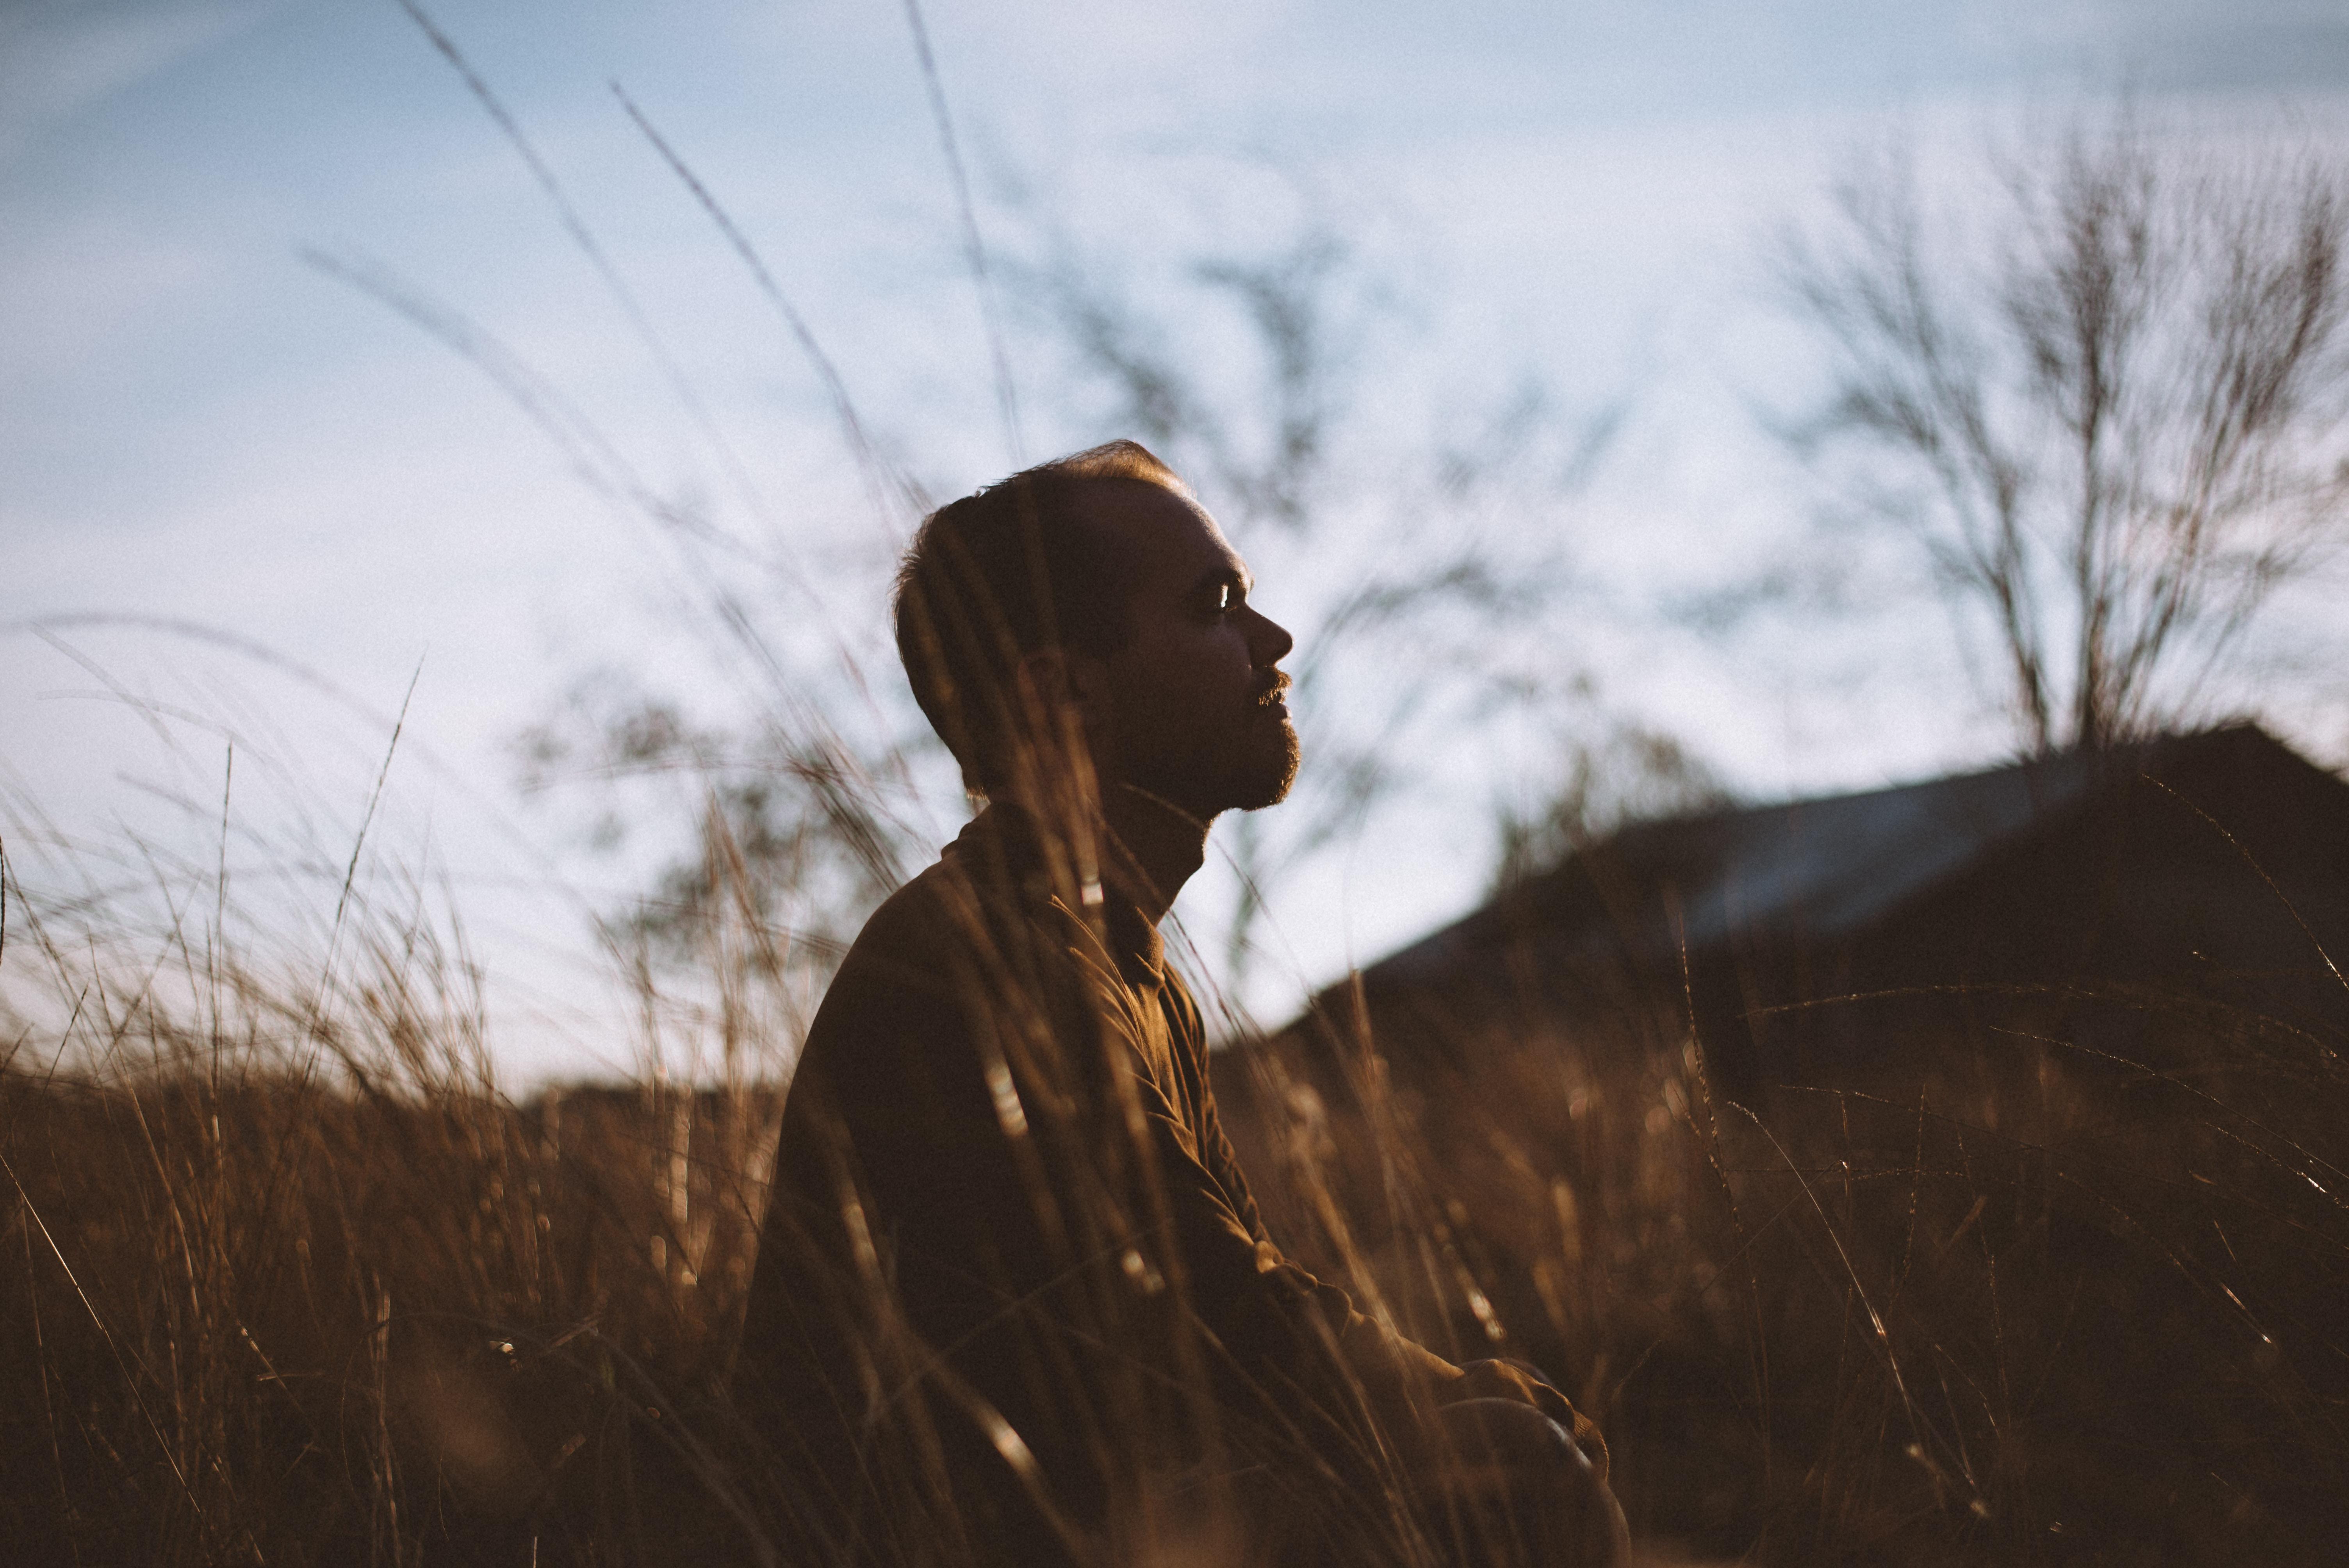 silhouette-of-man-sitting-on-grass-field-at-daytime-775417.jpg